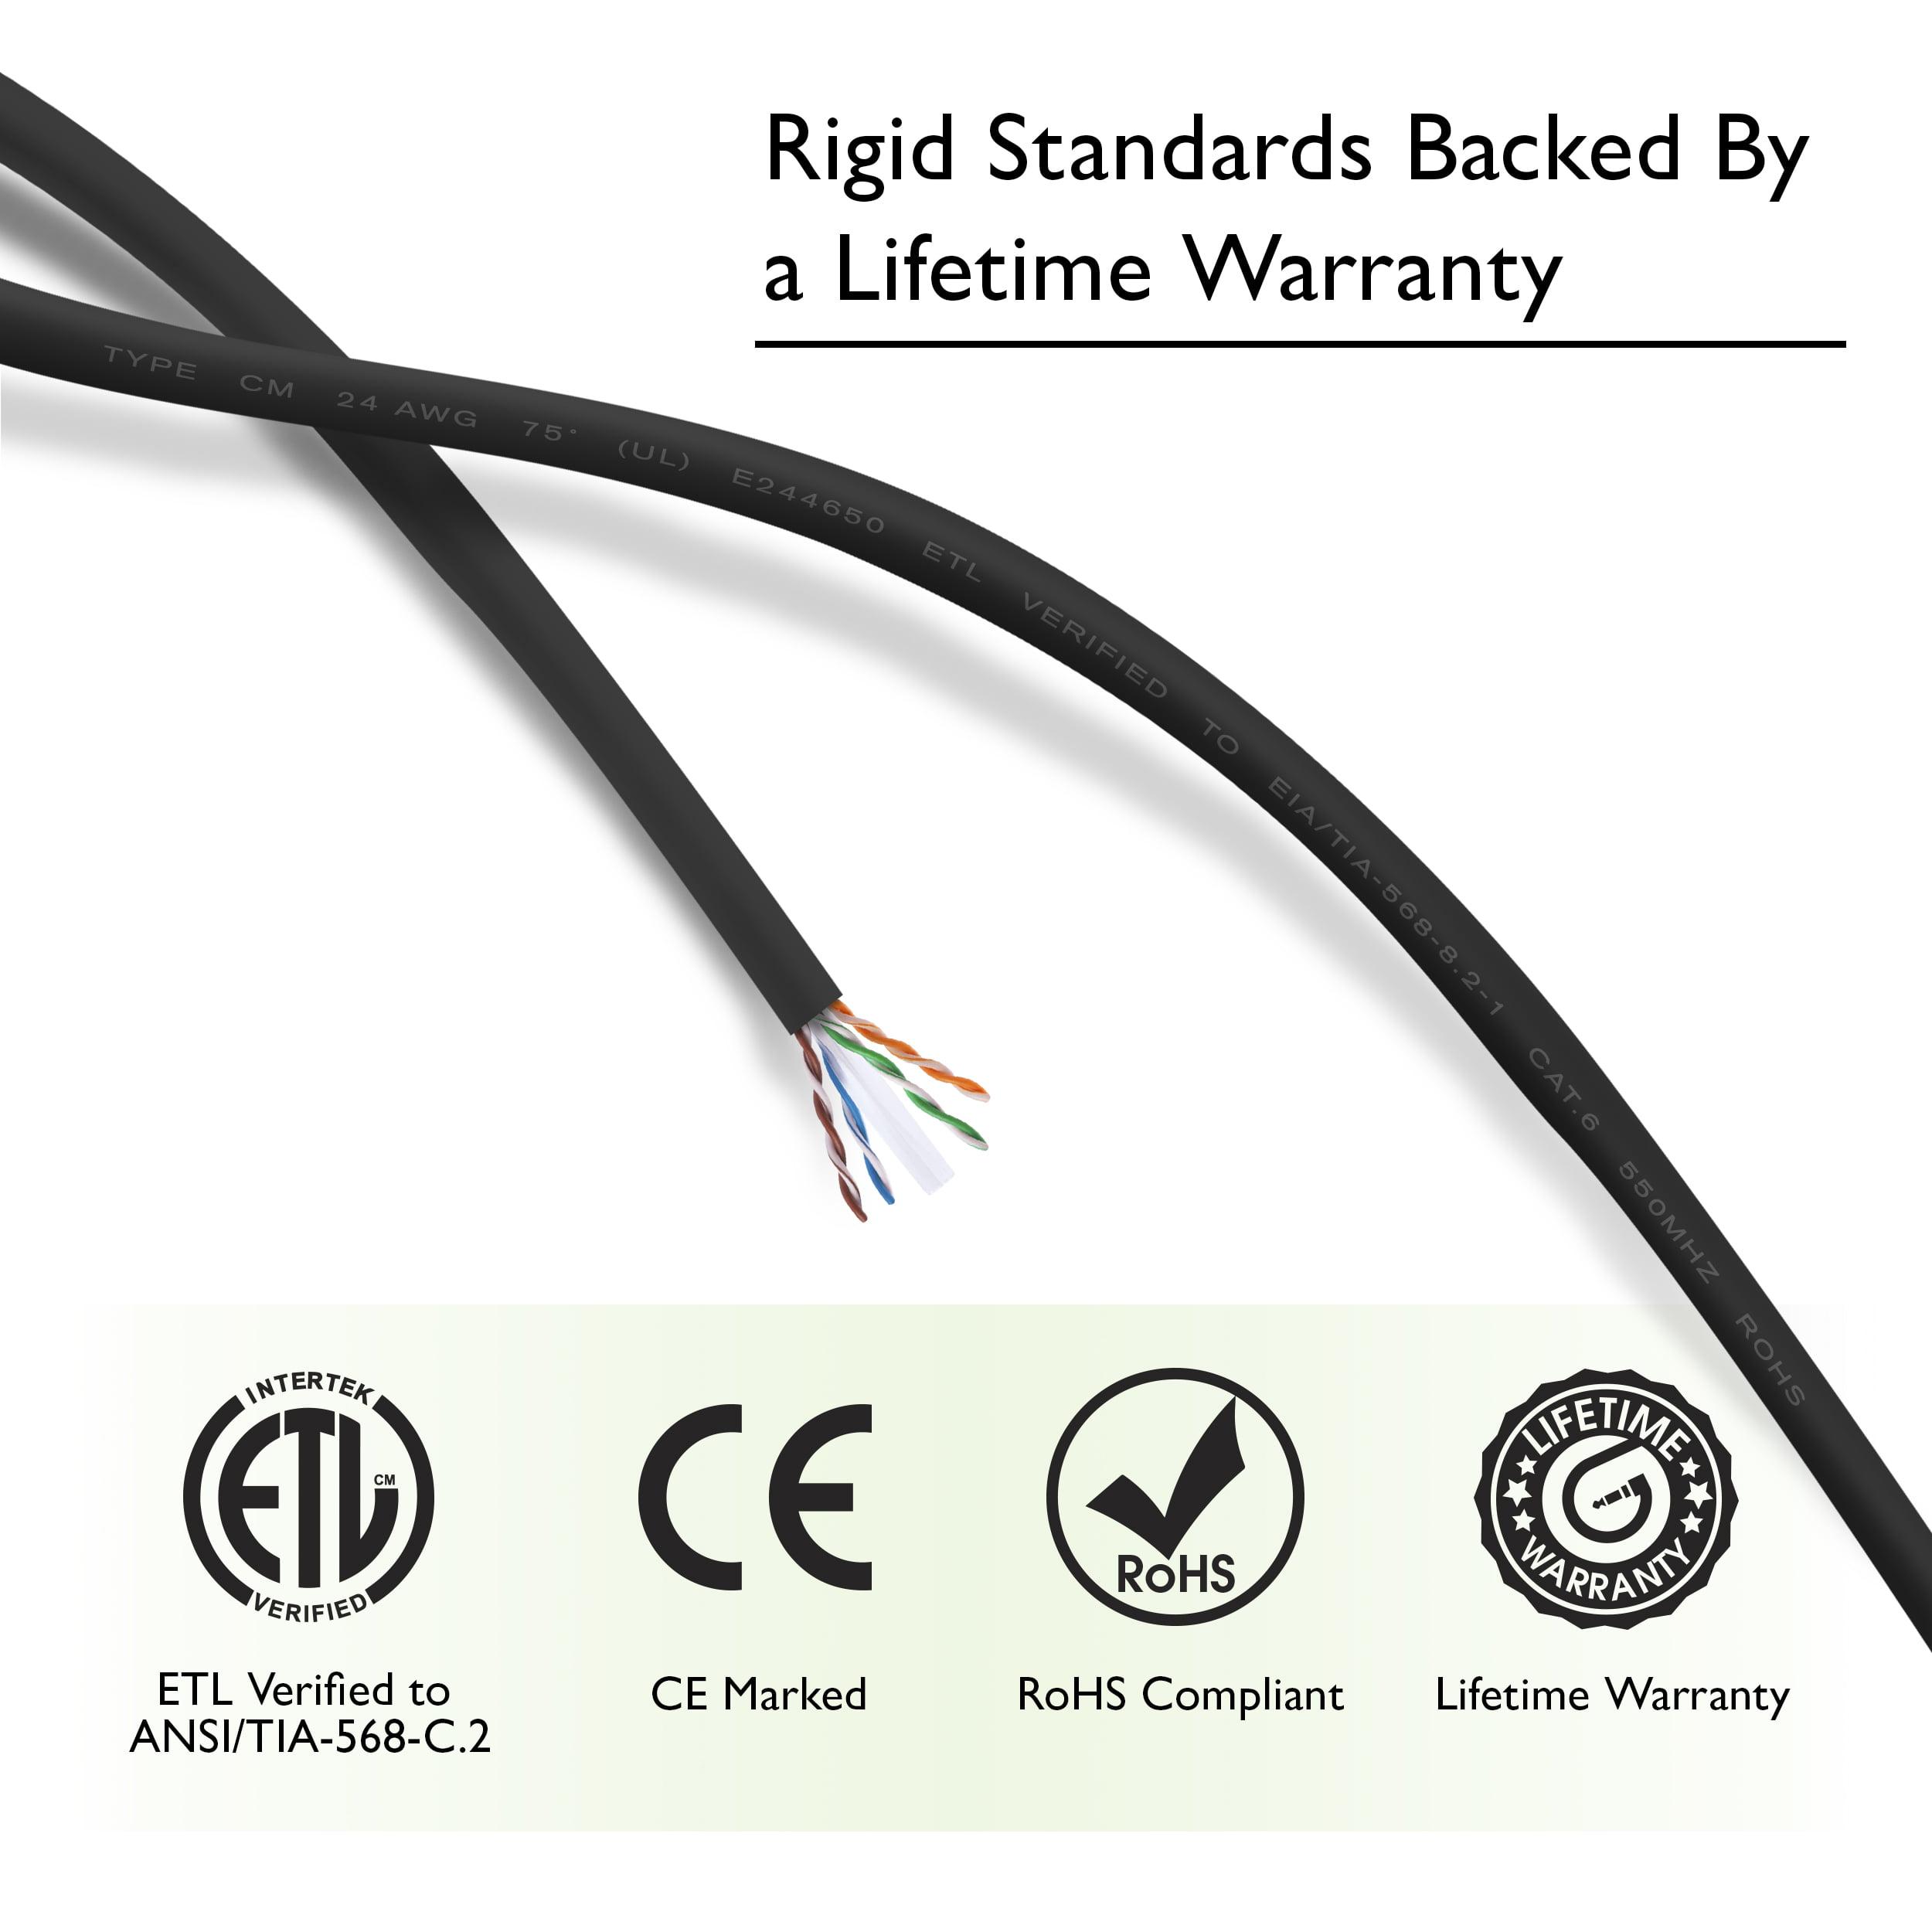 Cat 6 568c Cable Wiring Diagram Manual E Books Standard 5 All Diagramgearit 1000 Feet Bulk Cat6 Ethernet